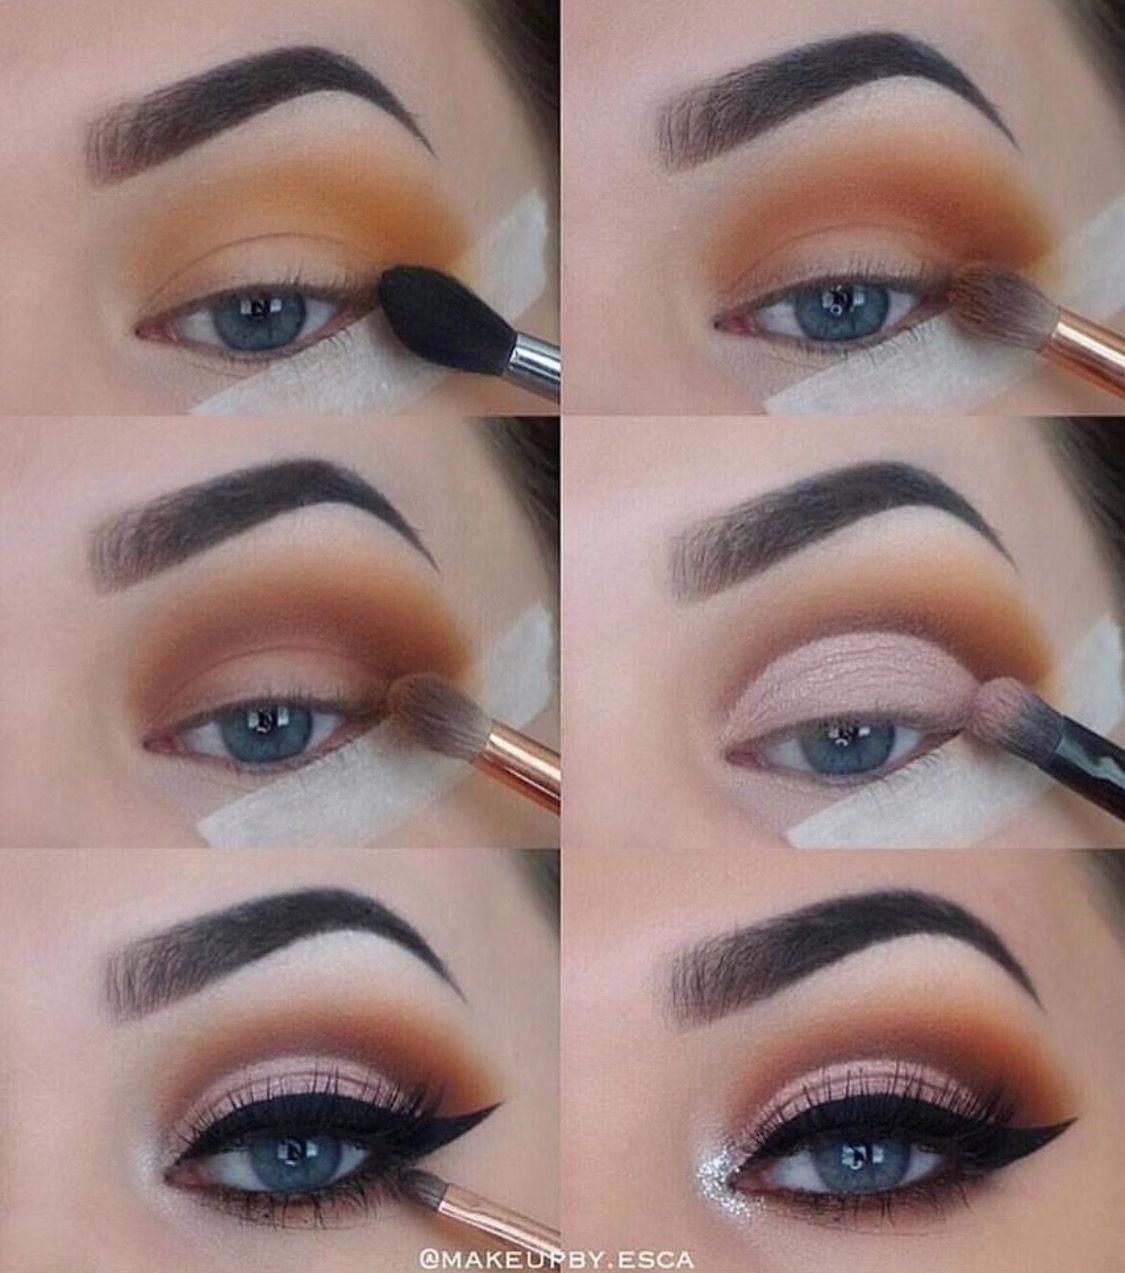 Eyemakeup Brown eye makeup tutorial, Eye makeup steps